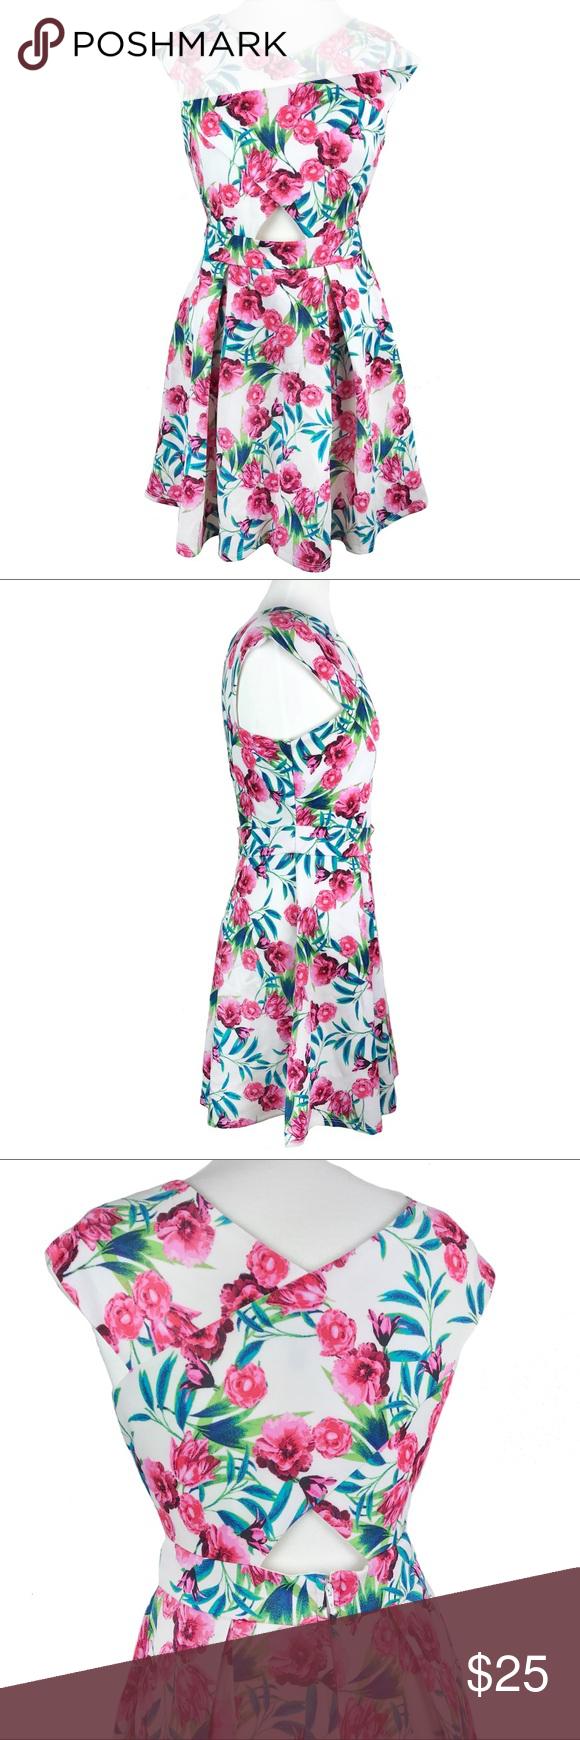 Modcloth Resort Most Ravishing Dress Nwot Floral Fit And